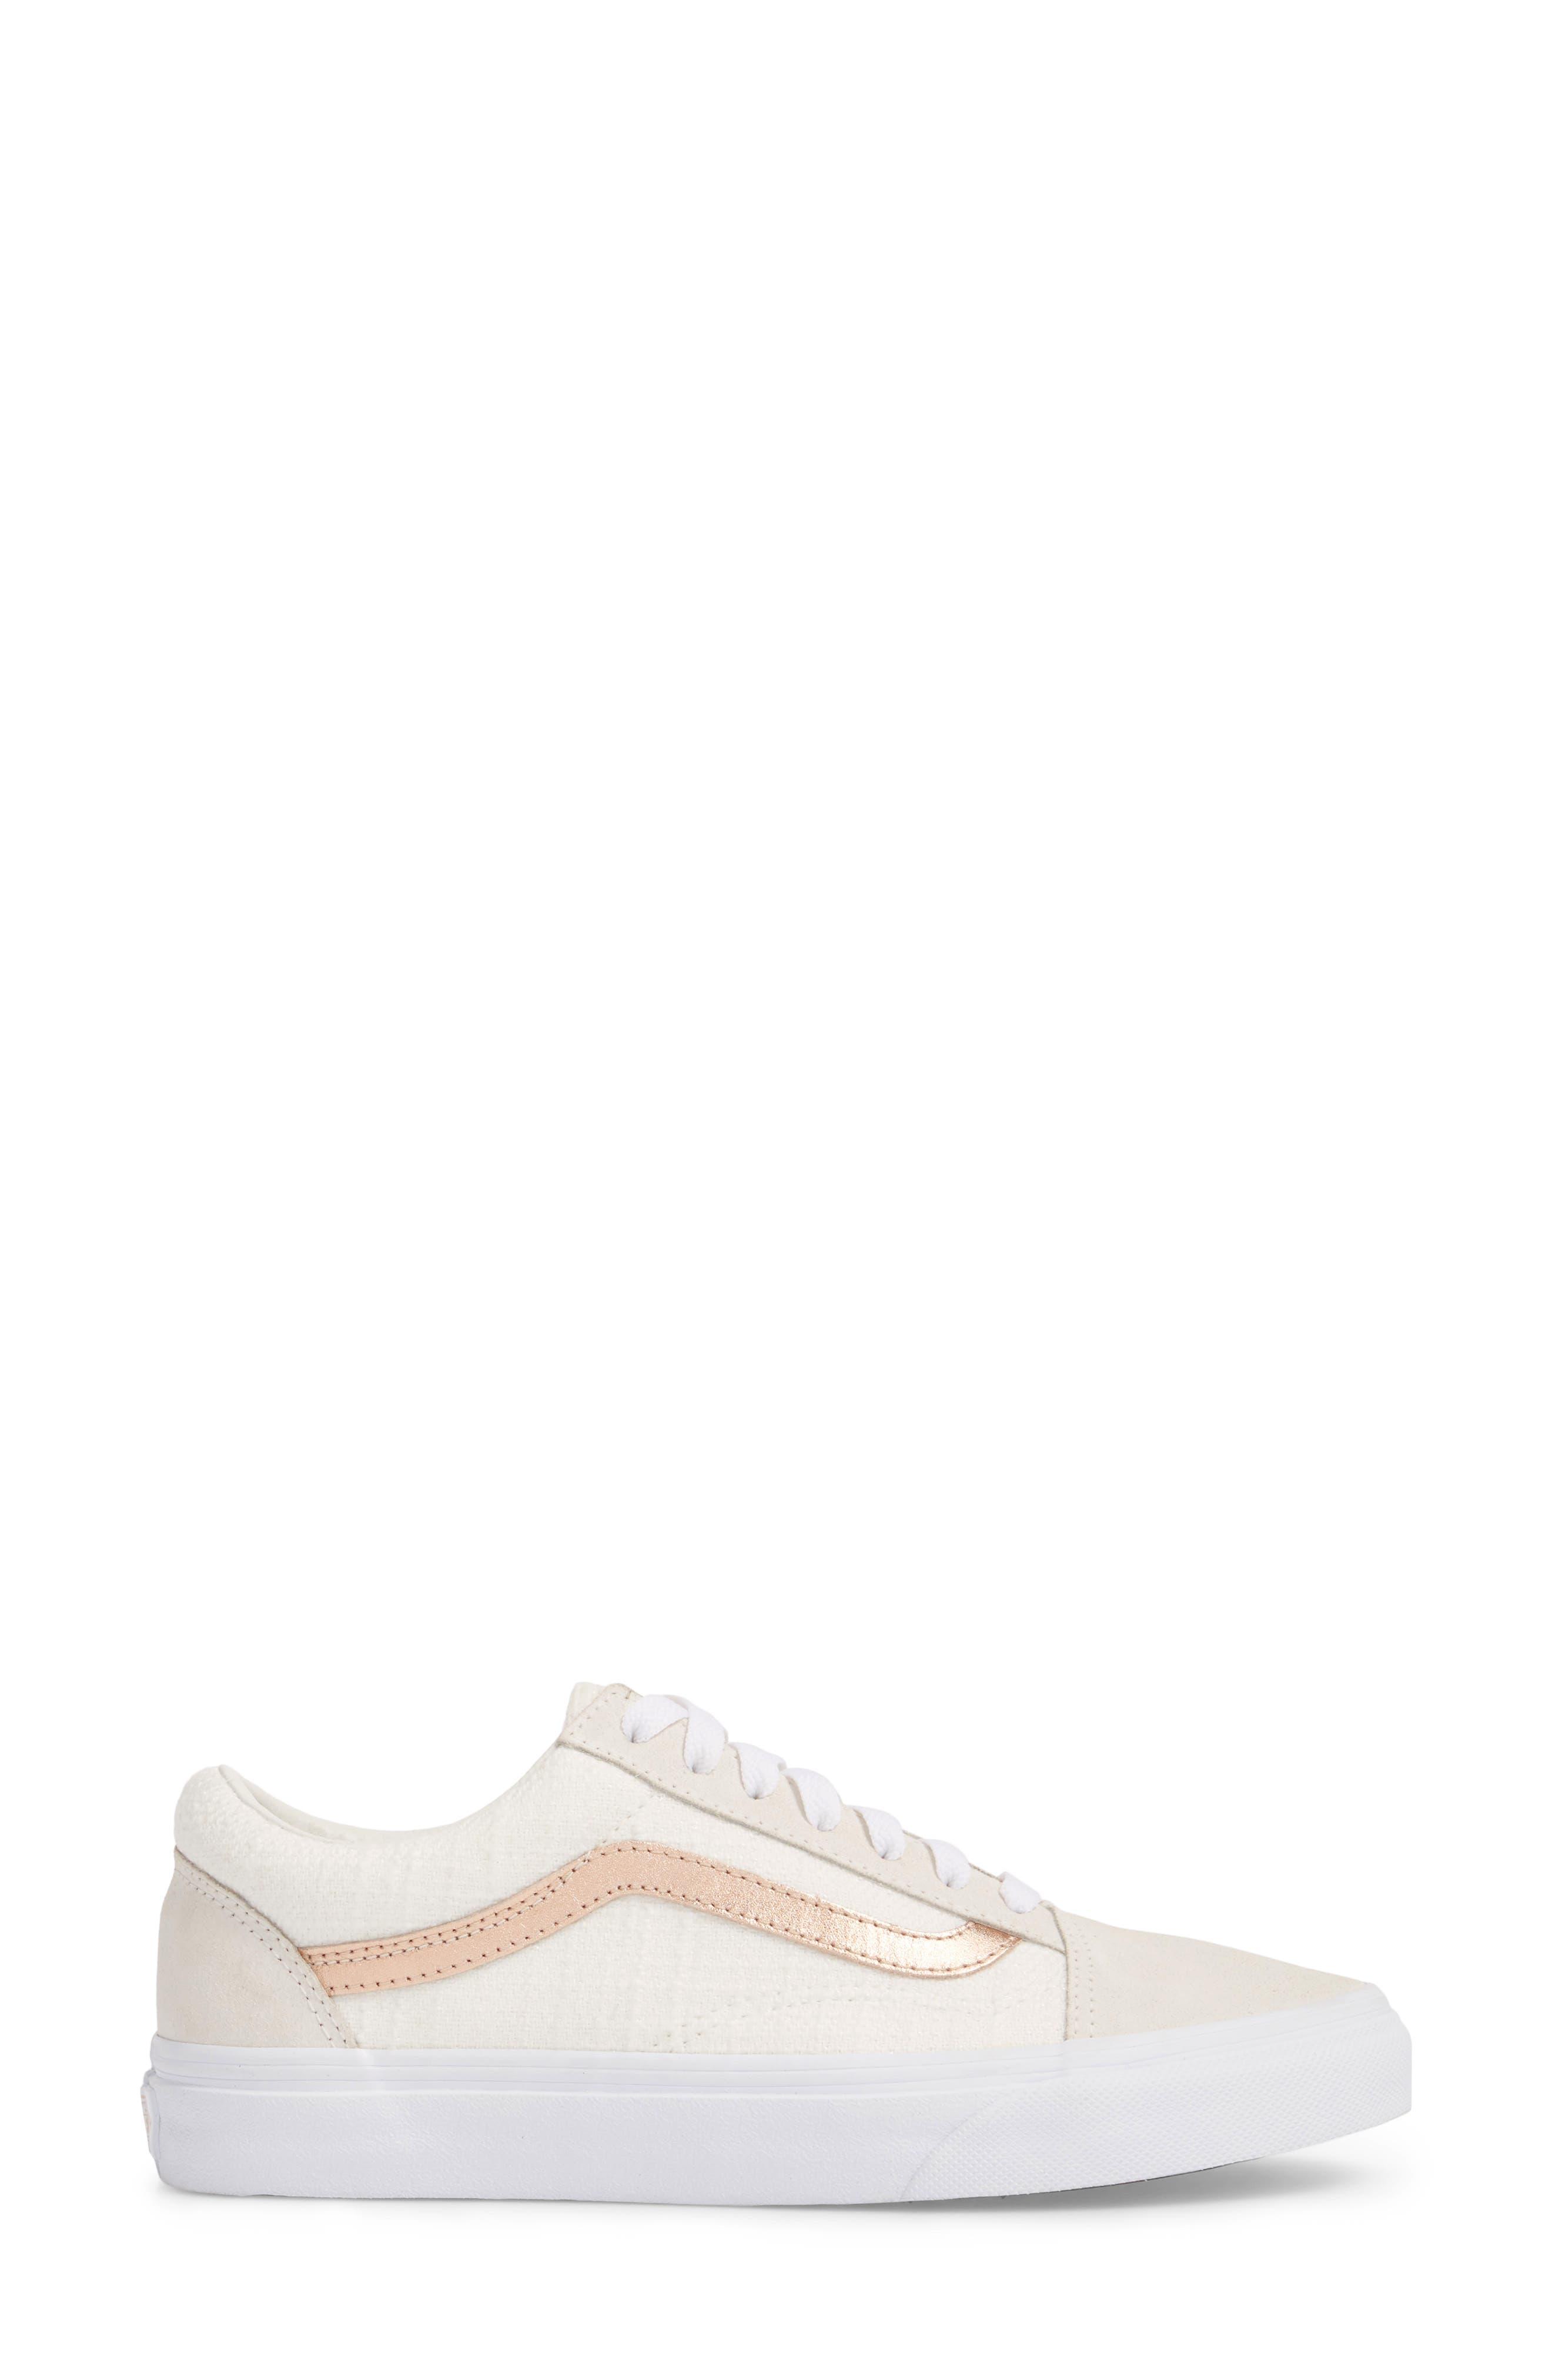 Old Skool Sneaker,                             Alternate thumbnail 4, color,                             Blanc De Blanc/ Rose Gold